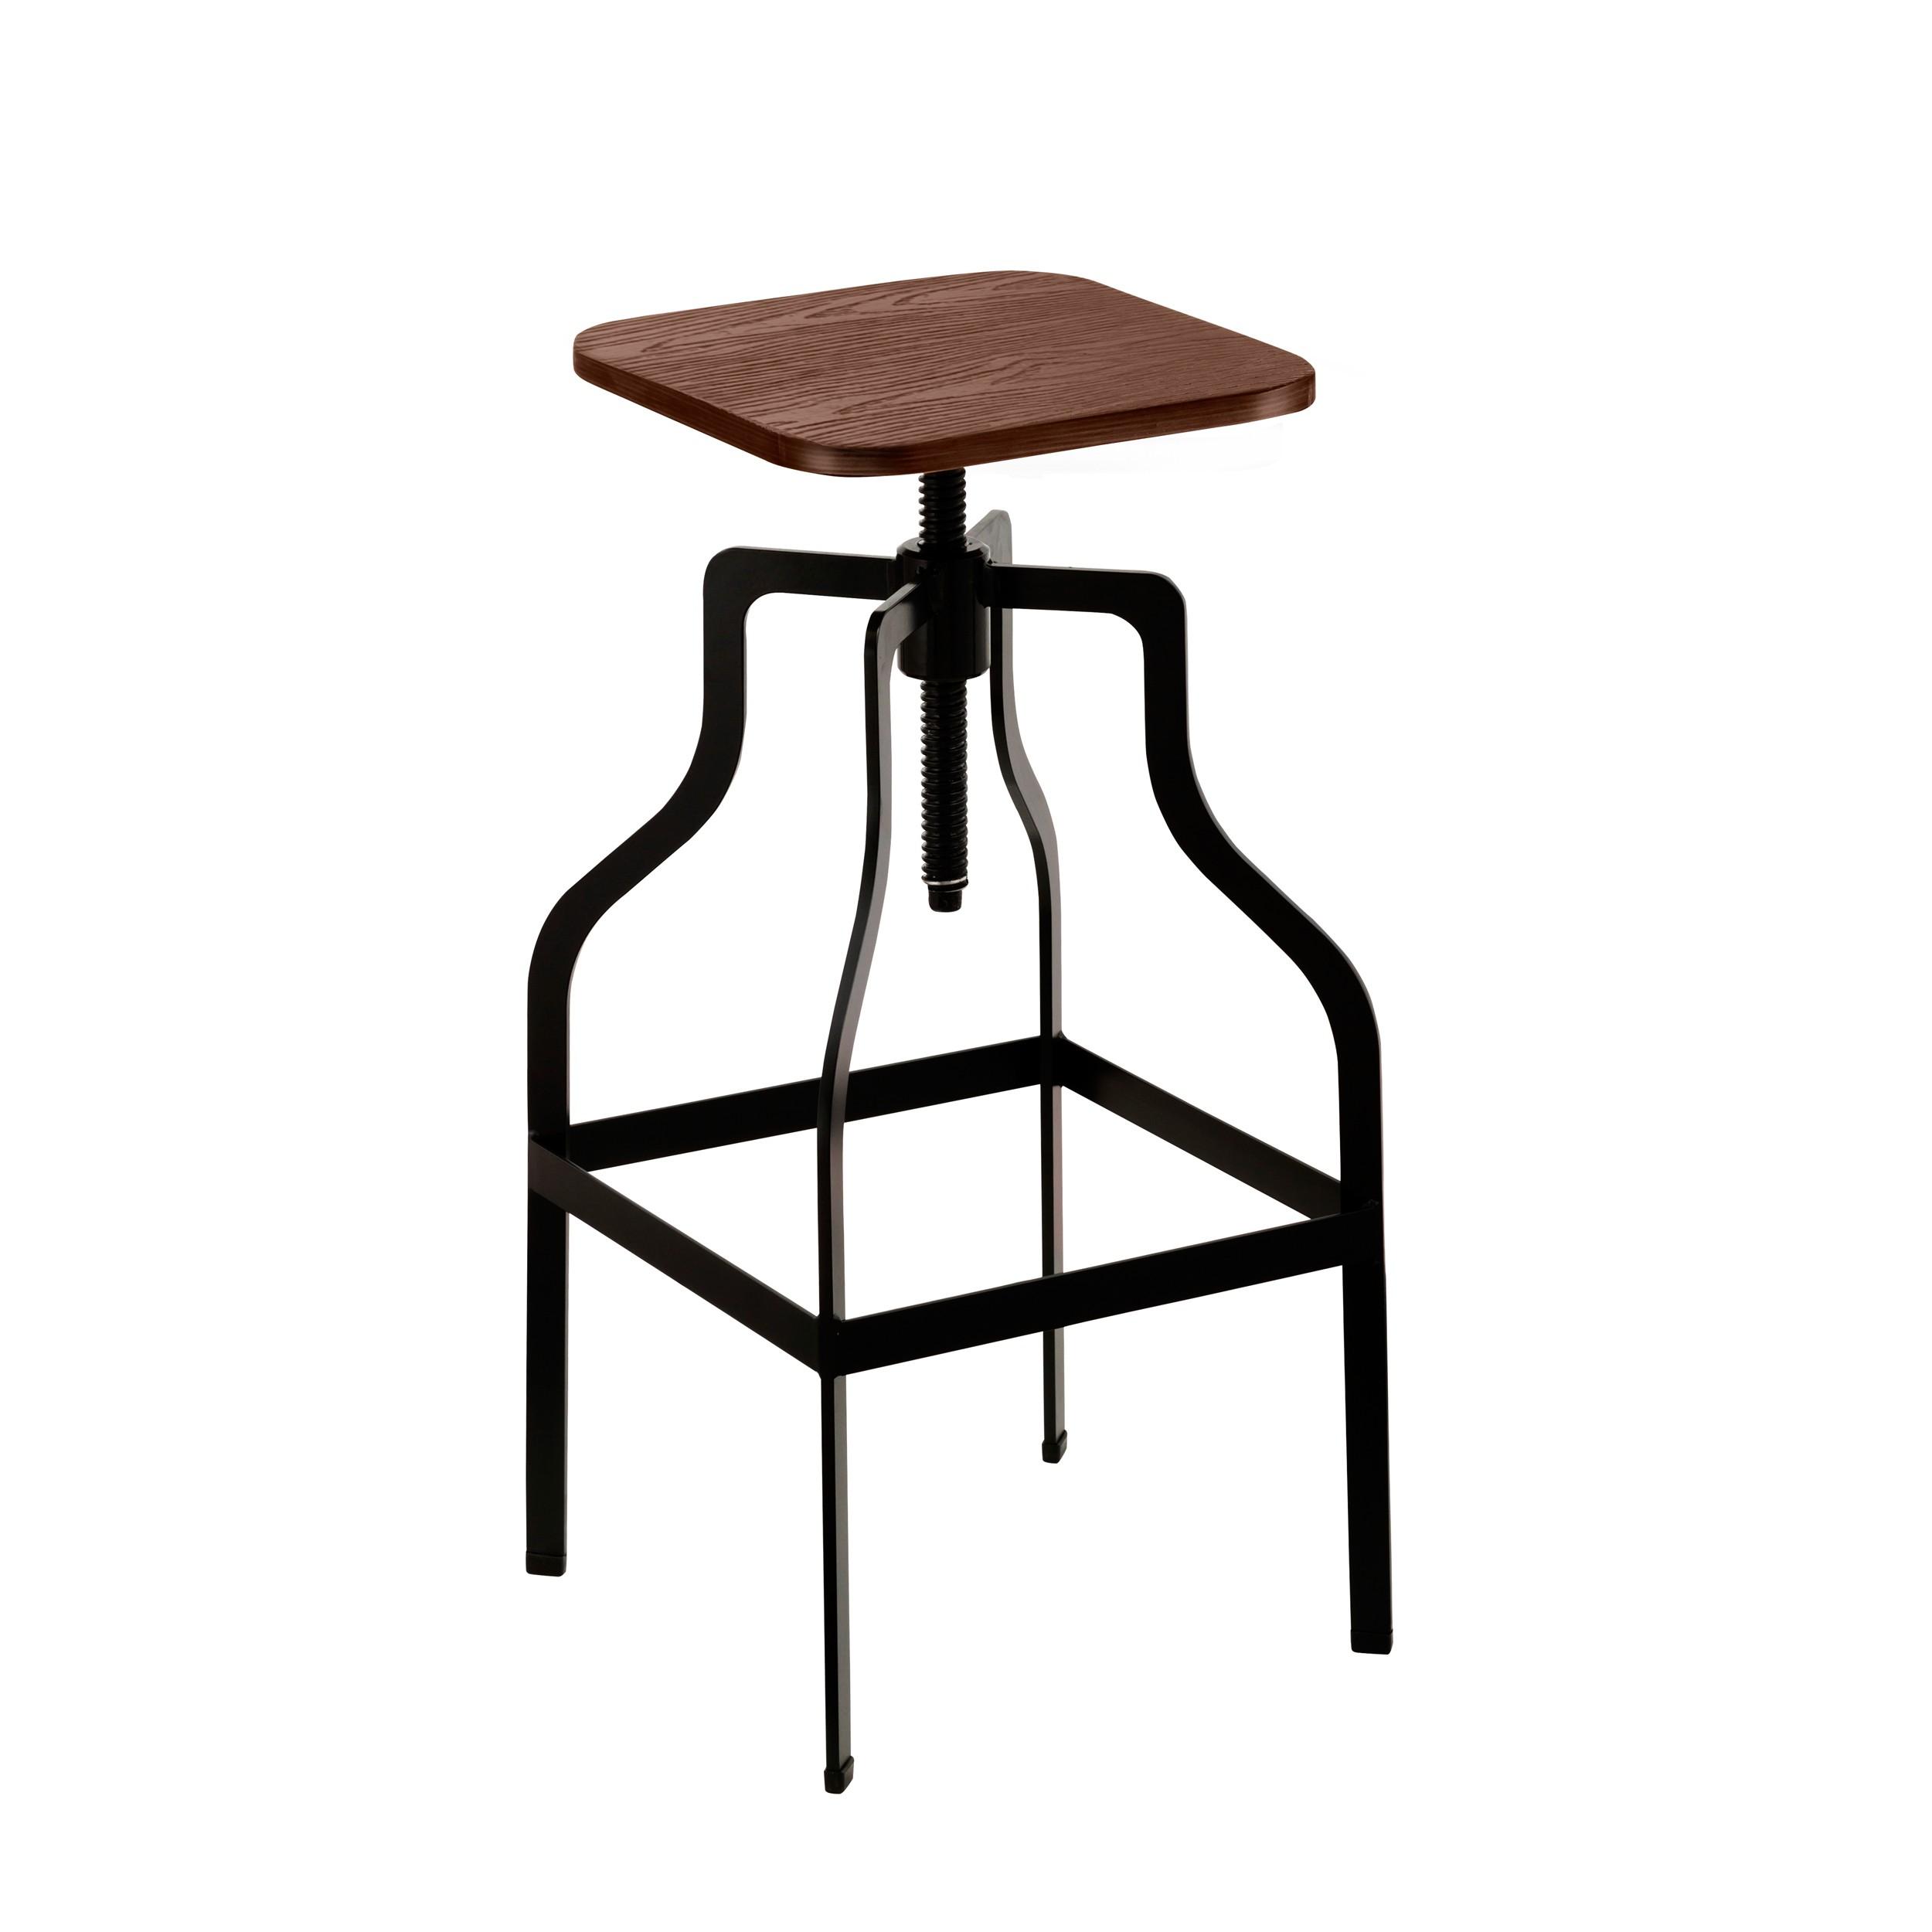 tabouret de bar bistro choisissez nos tabourets de bar bistro rdv d co. Black Bedroom Furniture Sets. Home Design Ideas